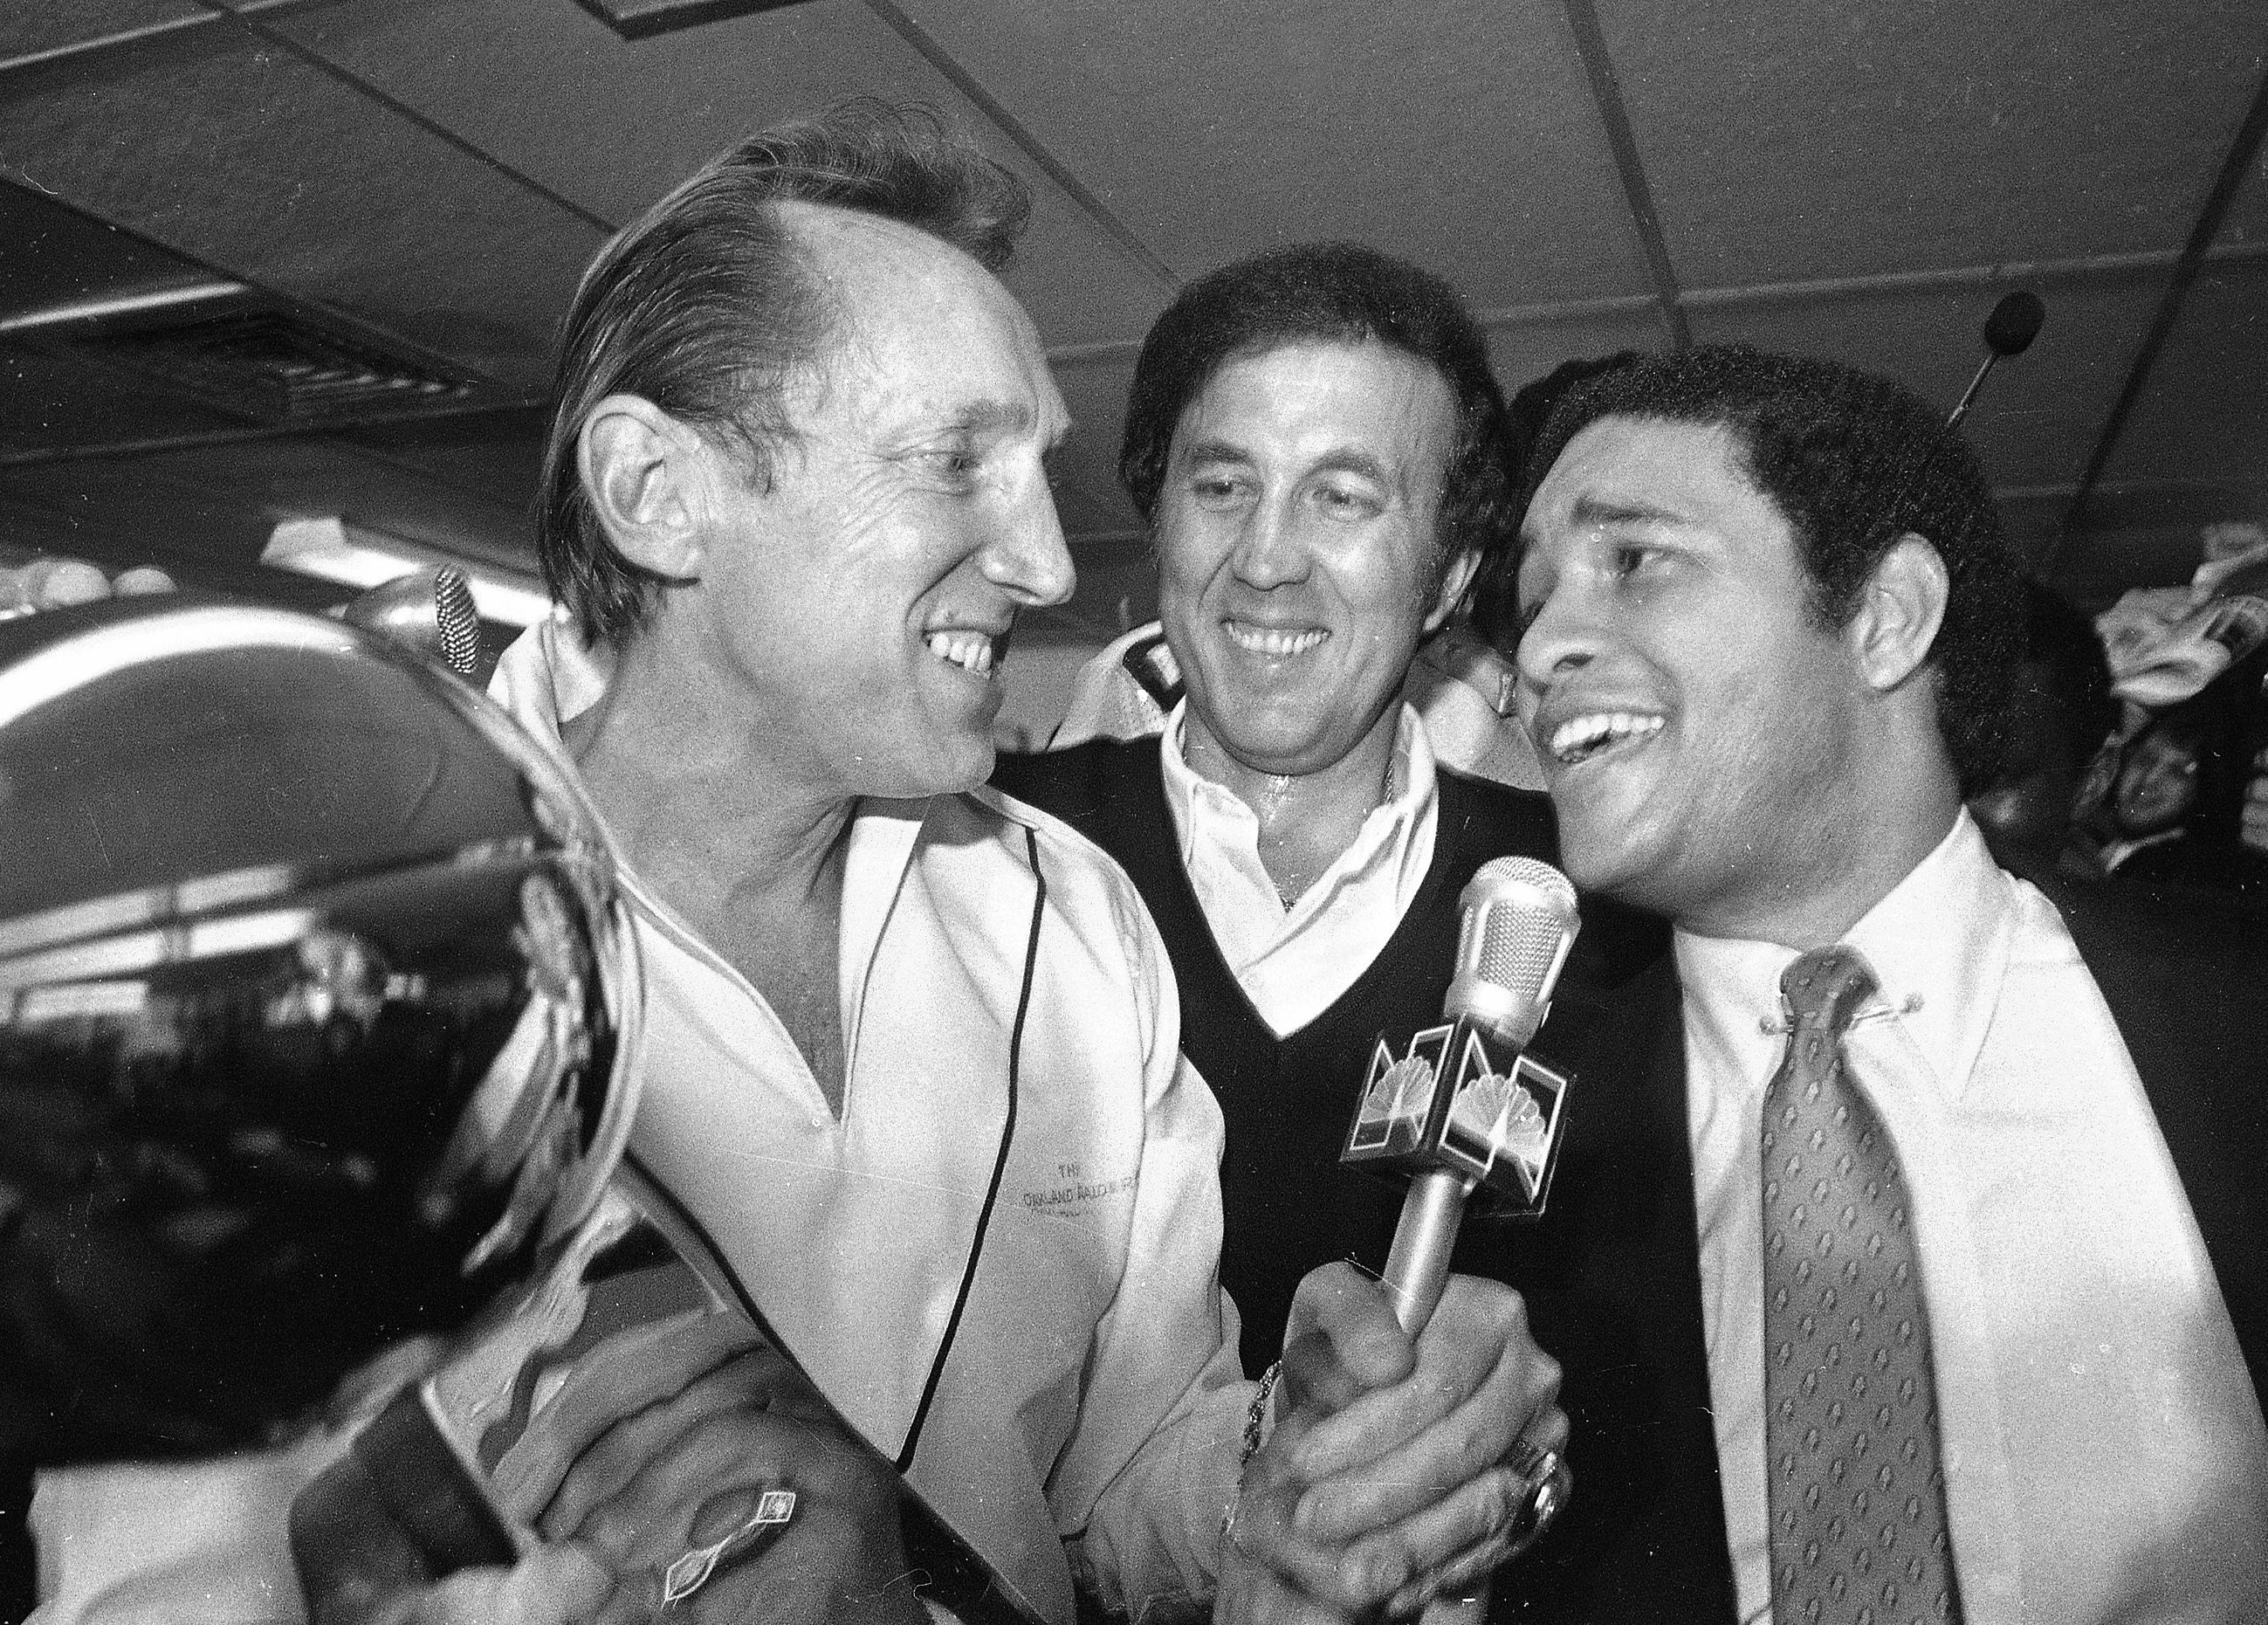 Flores Set Path As 1st Hispanic Coach To Win Super Bowl The